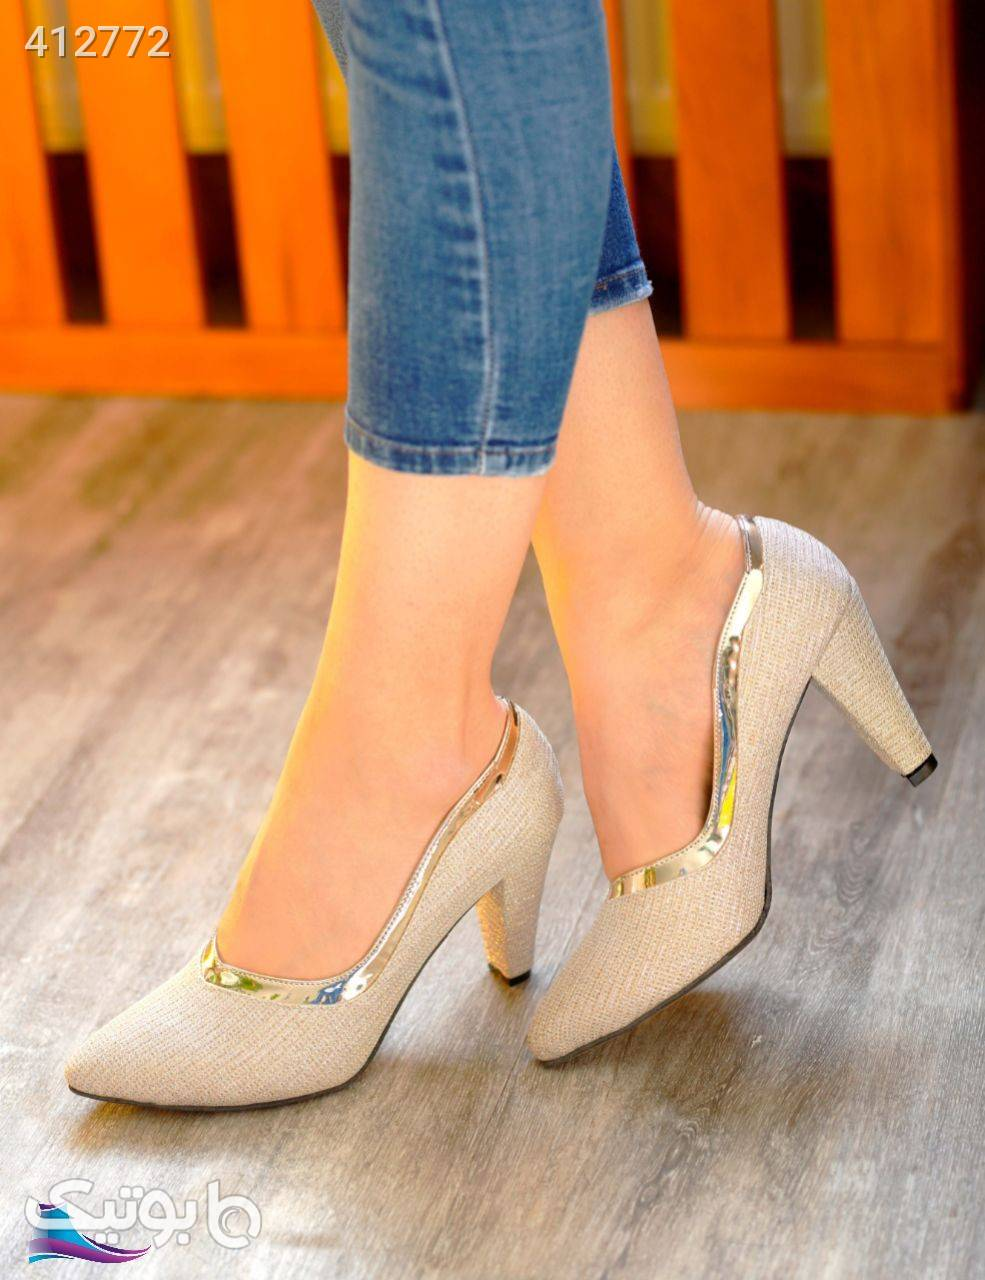 کفش مجلسی لمه مشکی كفش زنانه